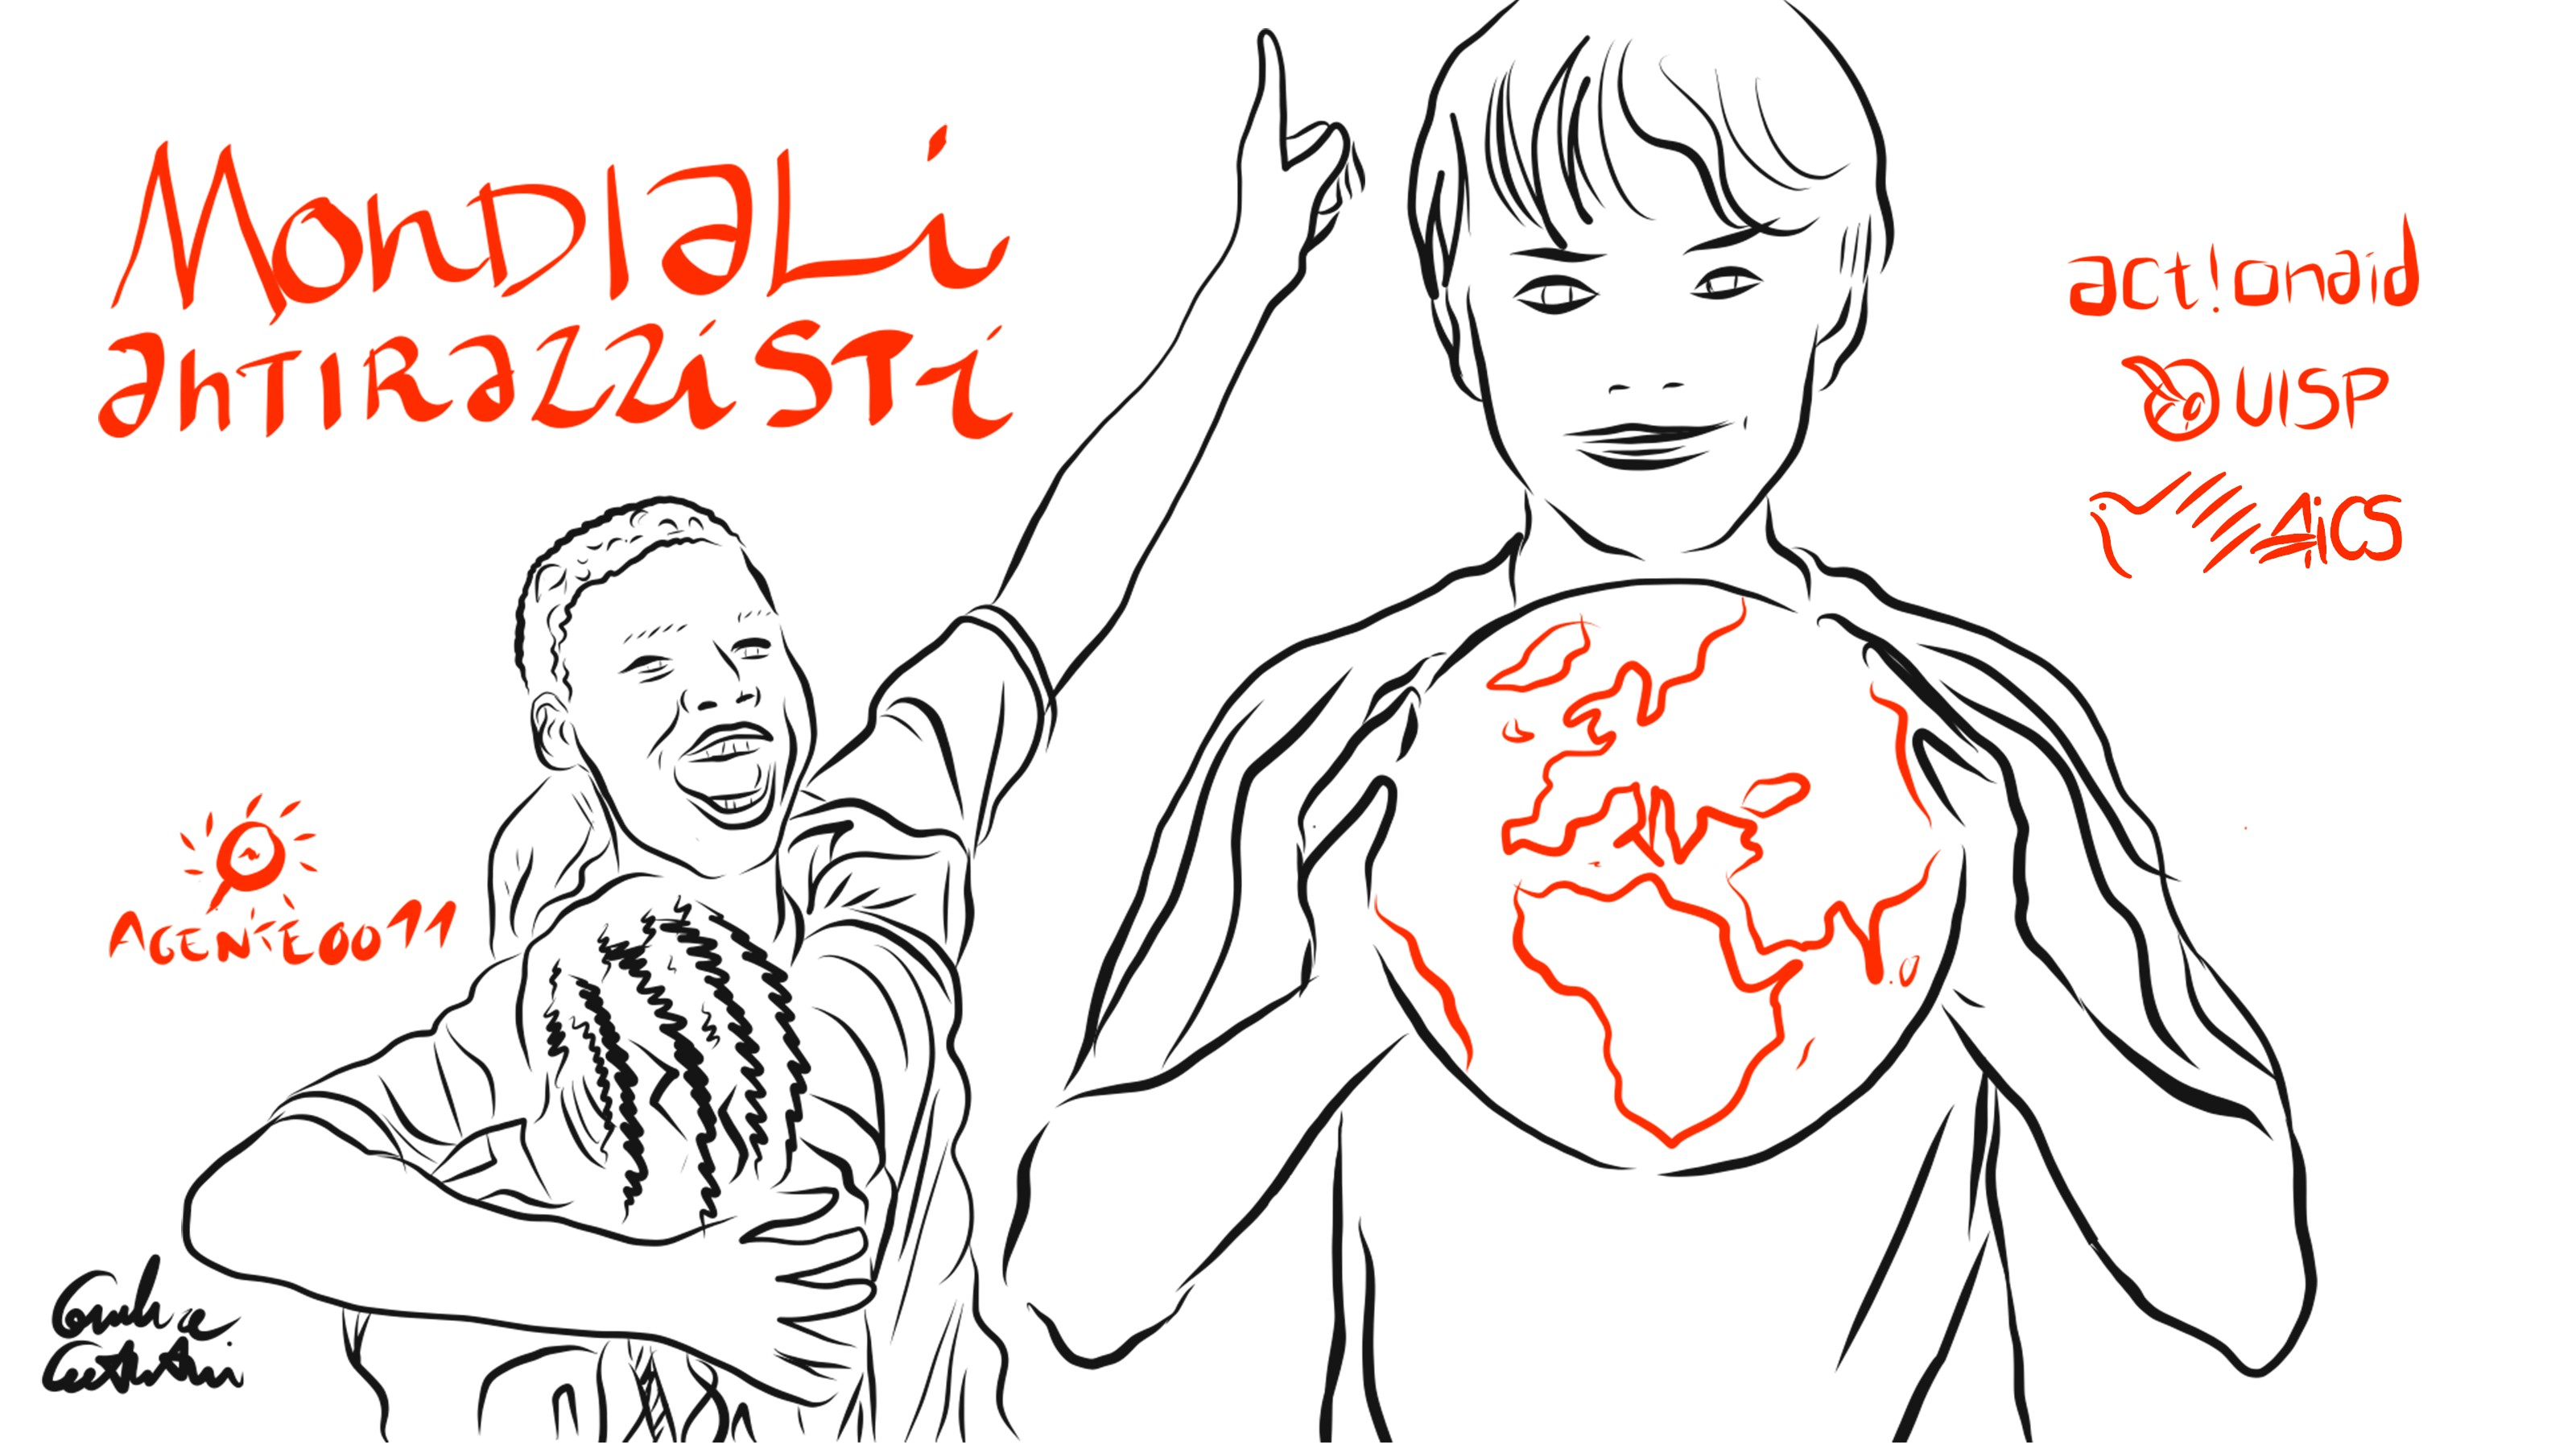 mondiali antirazzisti